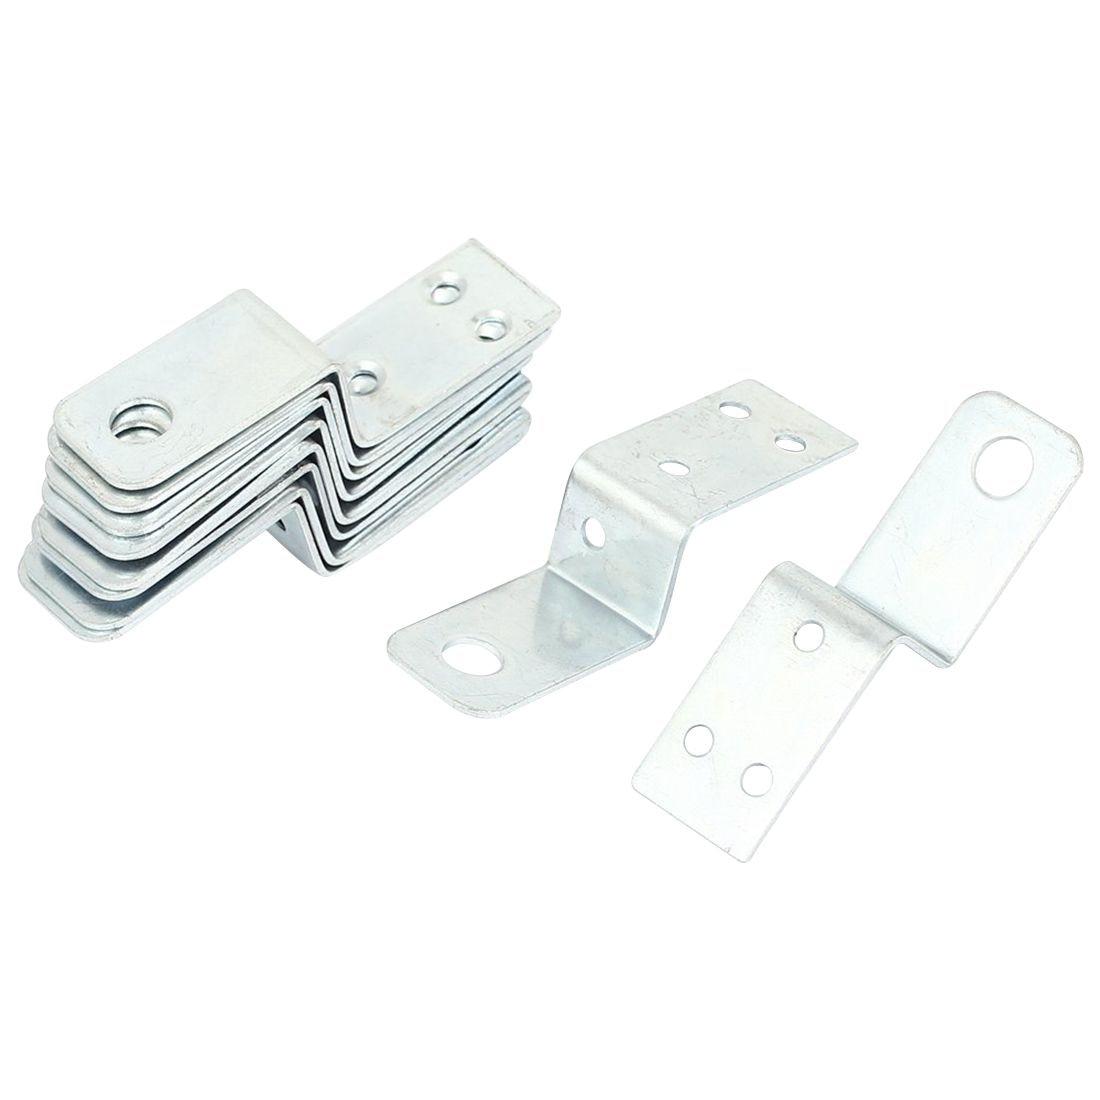 70mmx18mm Z Shape Shelf Corner Brace Plate Right Angle Bracket 10pcs bqlzr 10 x l shaped metal shelf support 25 x 25mm corner brace right angle bracket page 8